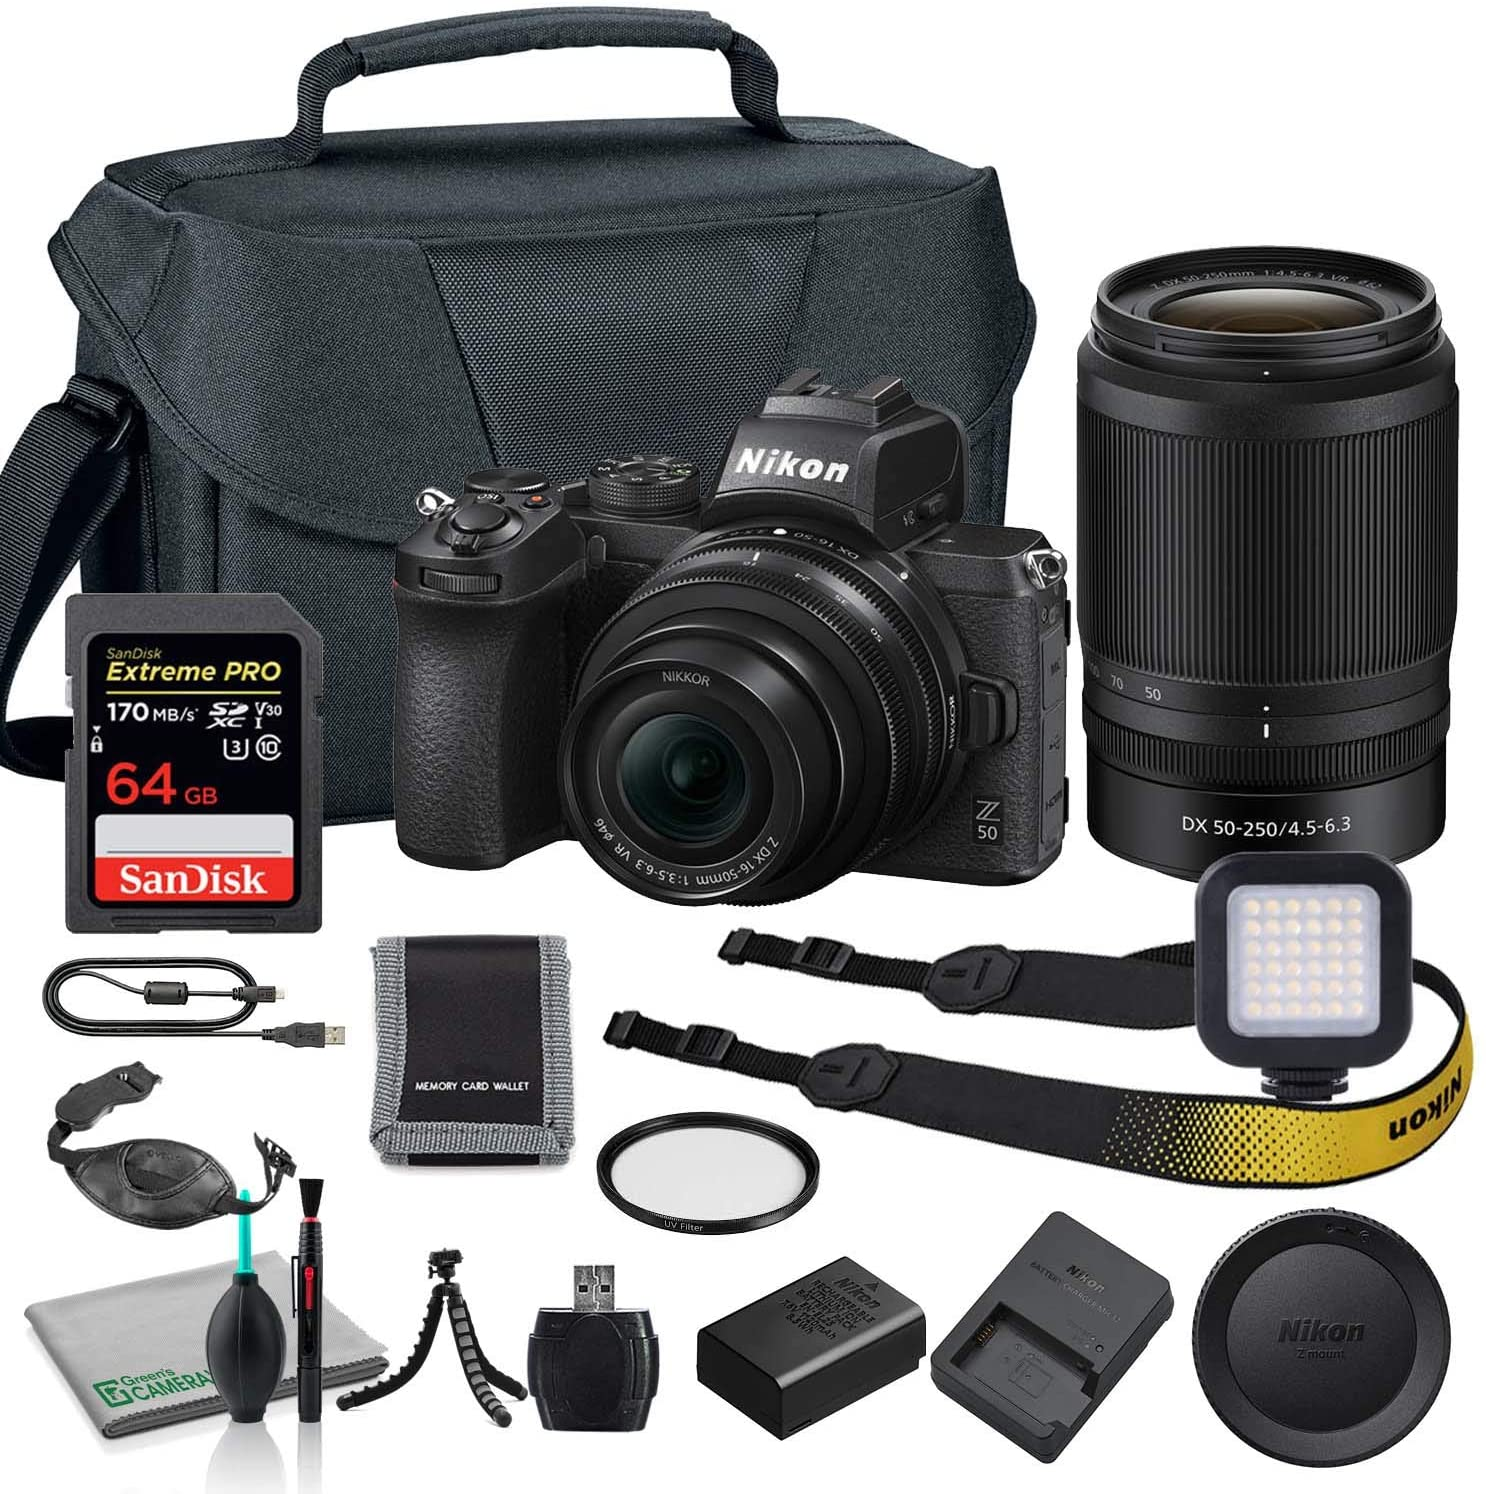 Nikon DSL Camera for Bike Photography